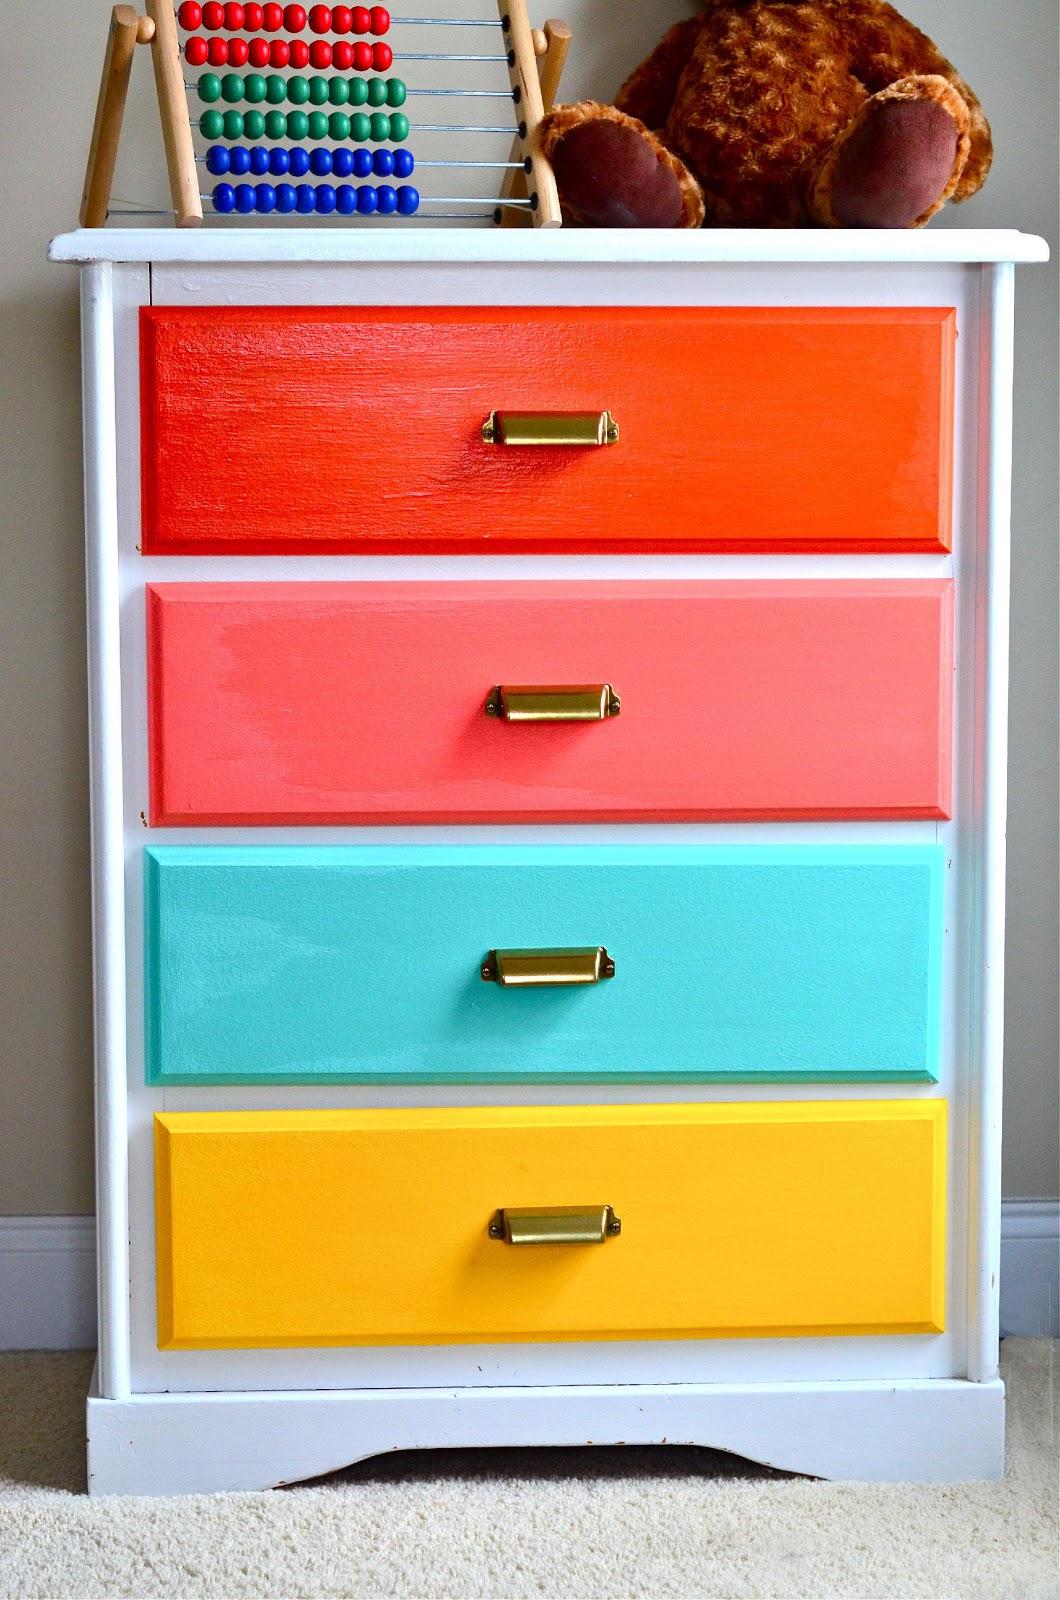 6. Color Coding Dresser for Kids by simphome.com